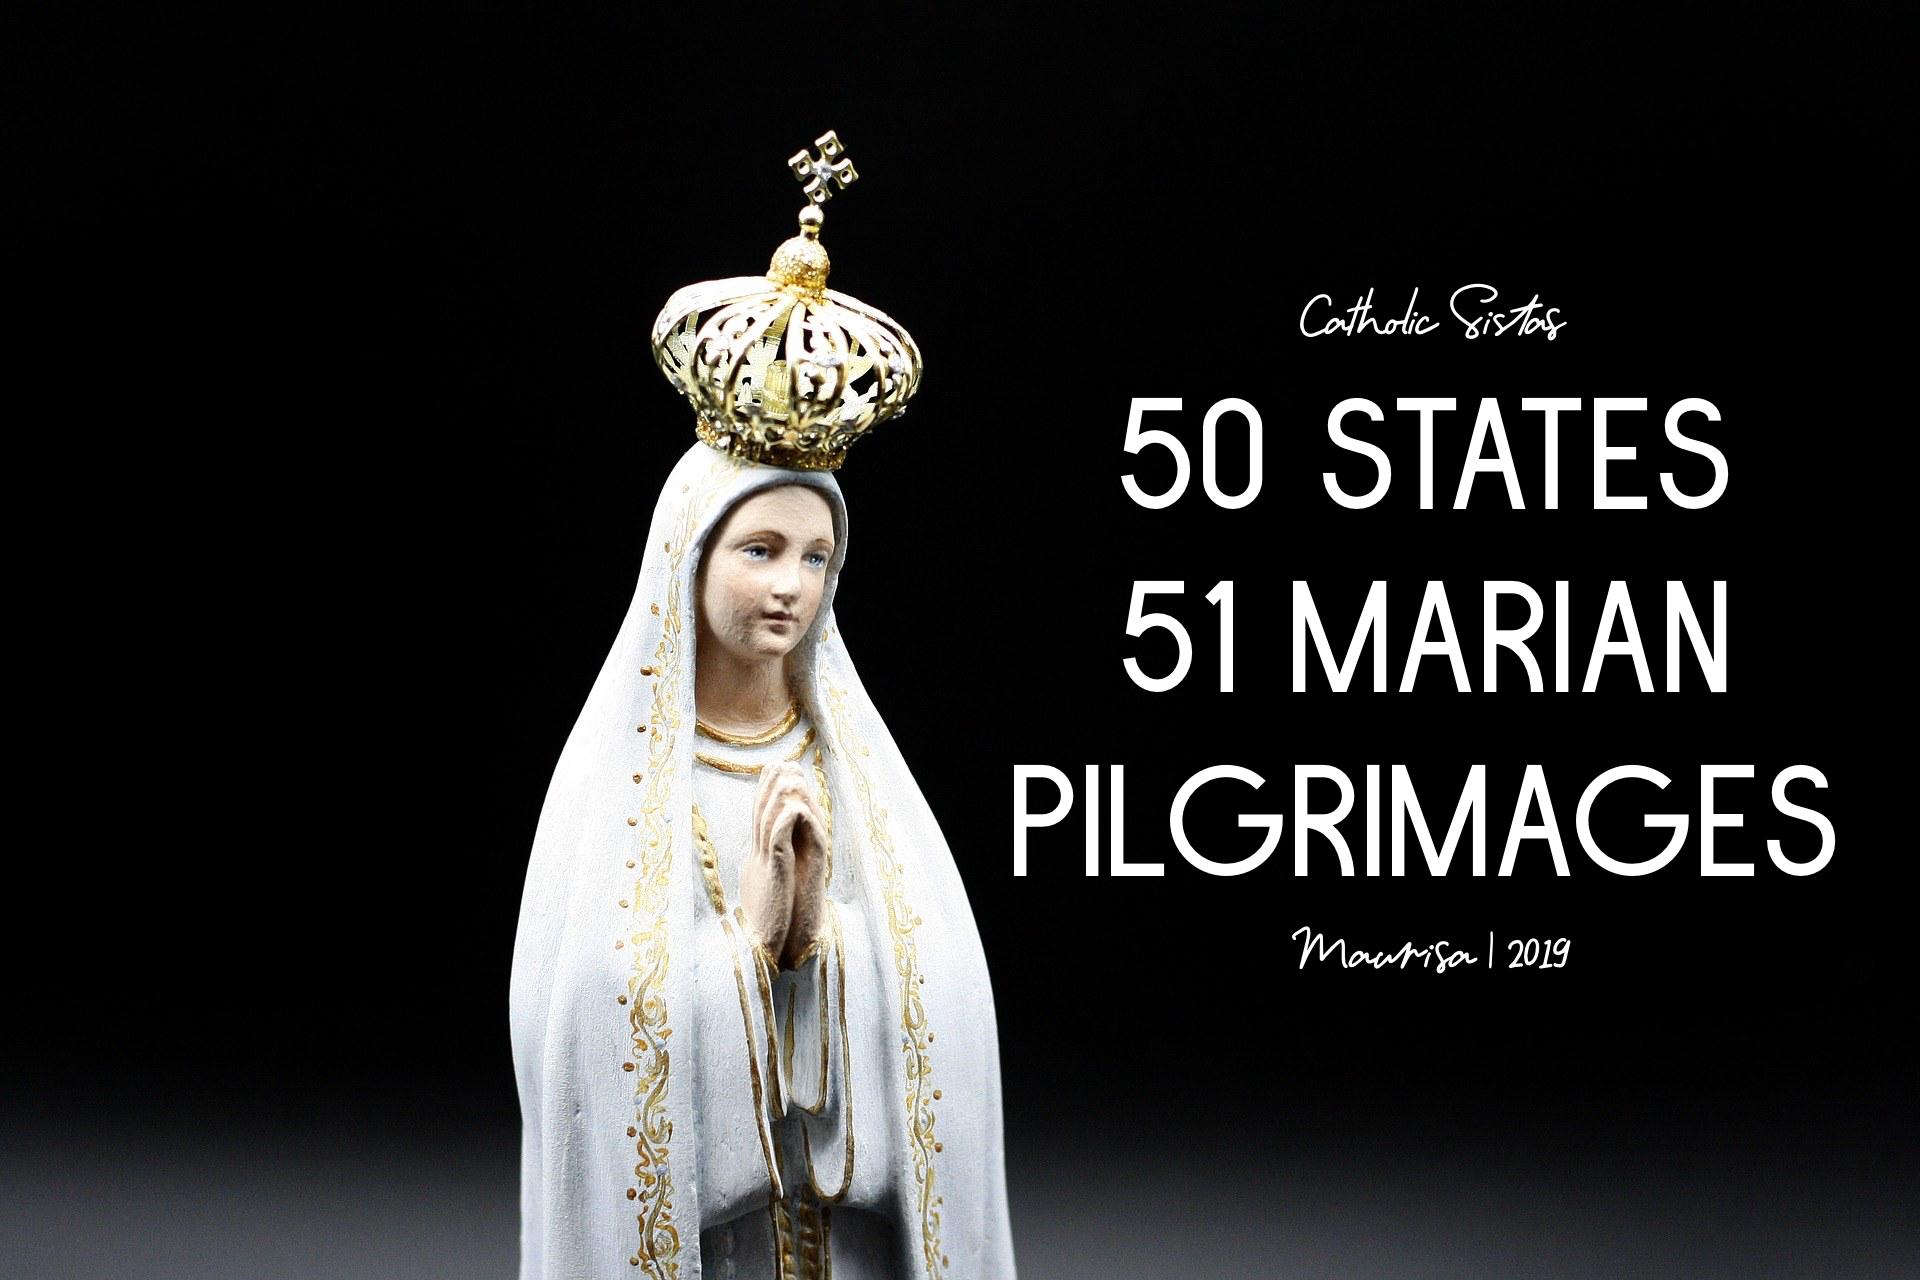 50 States 51 Marian Pilgrimages